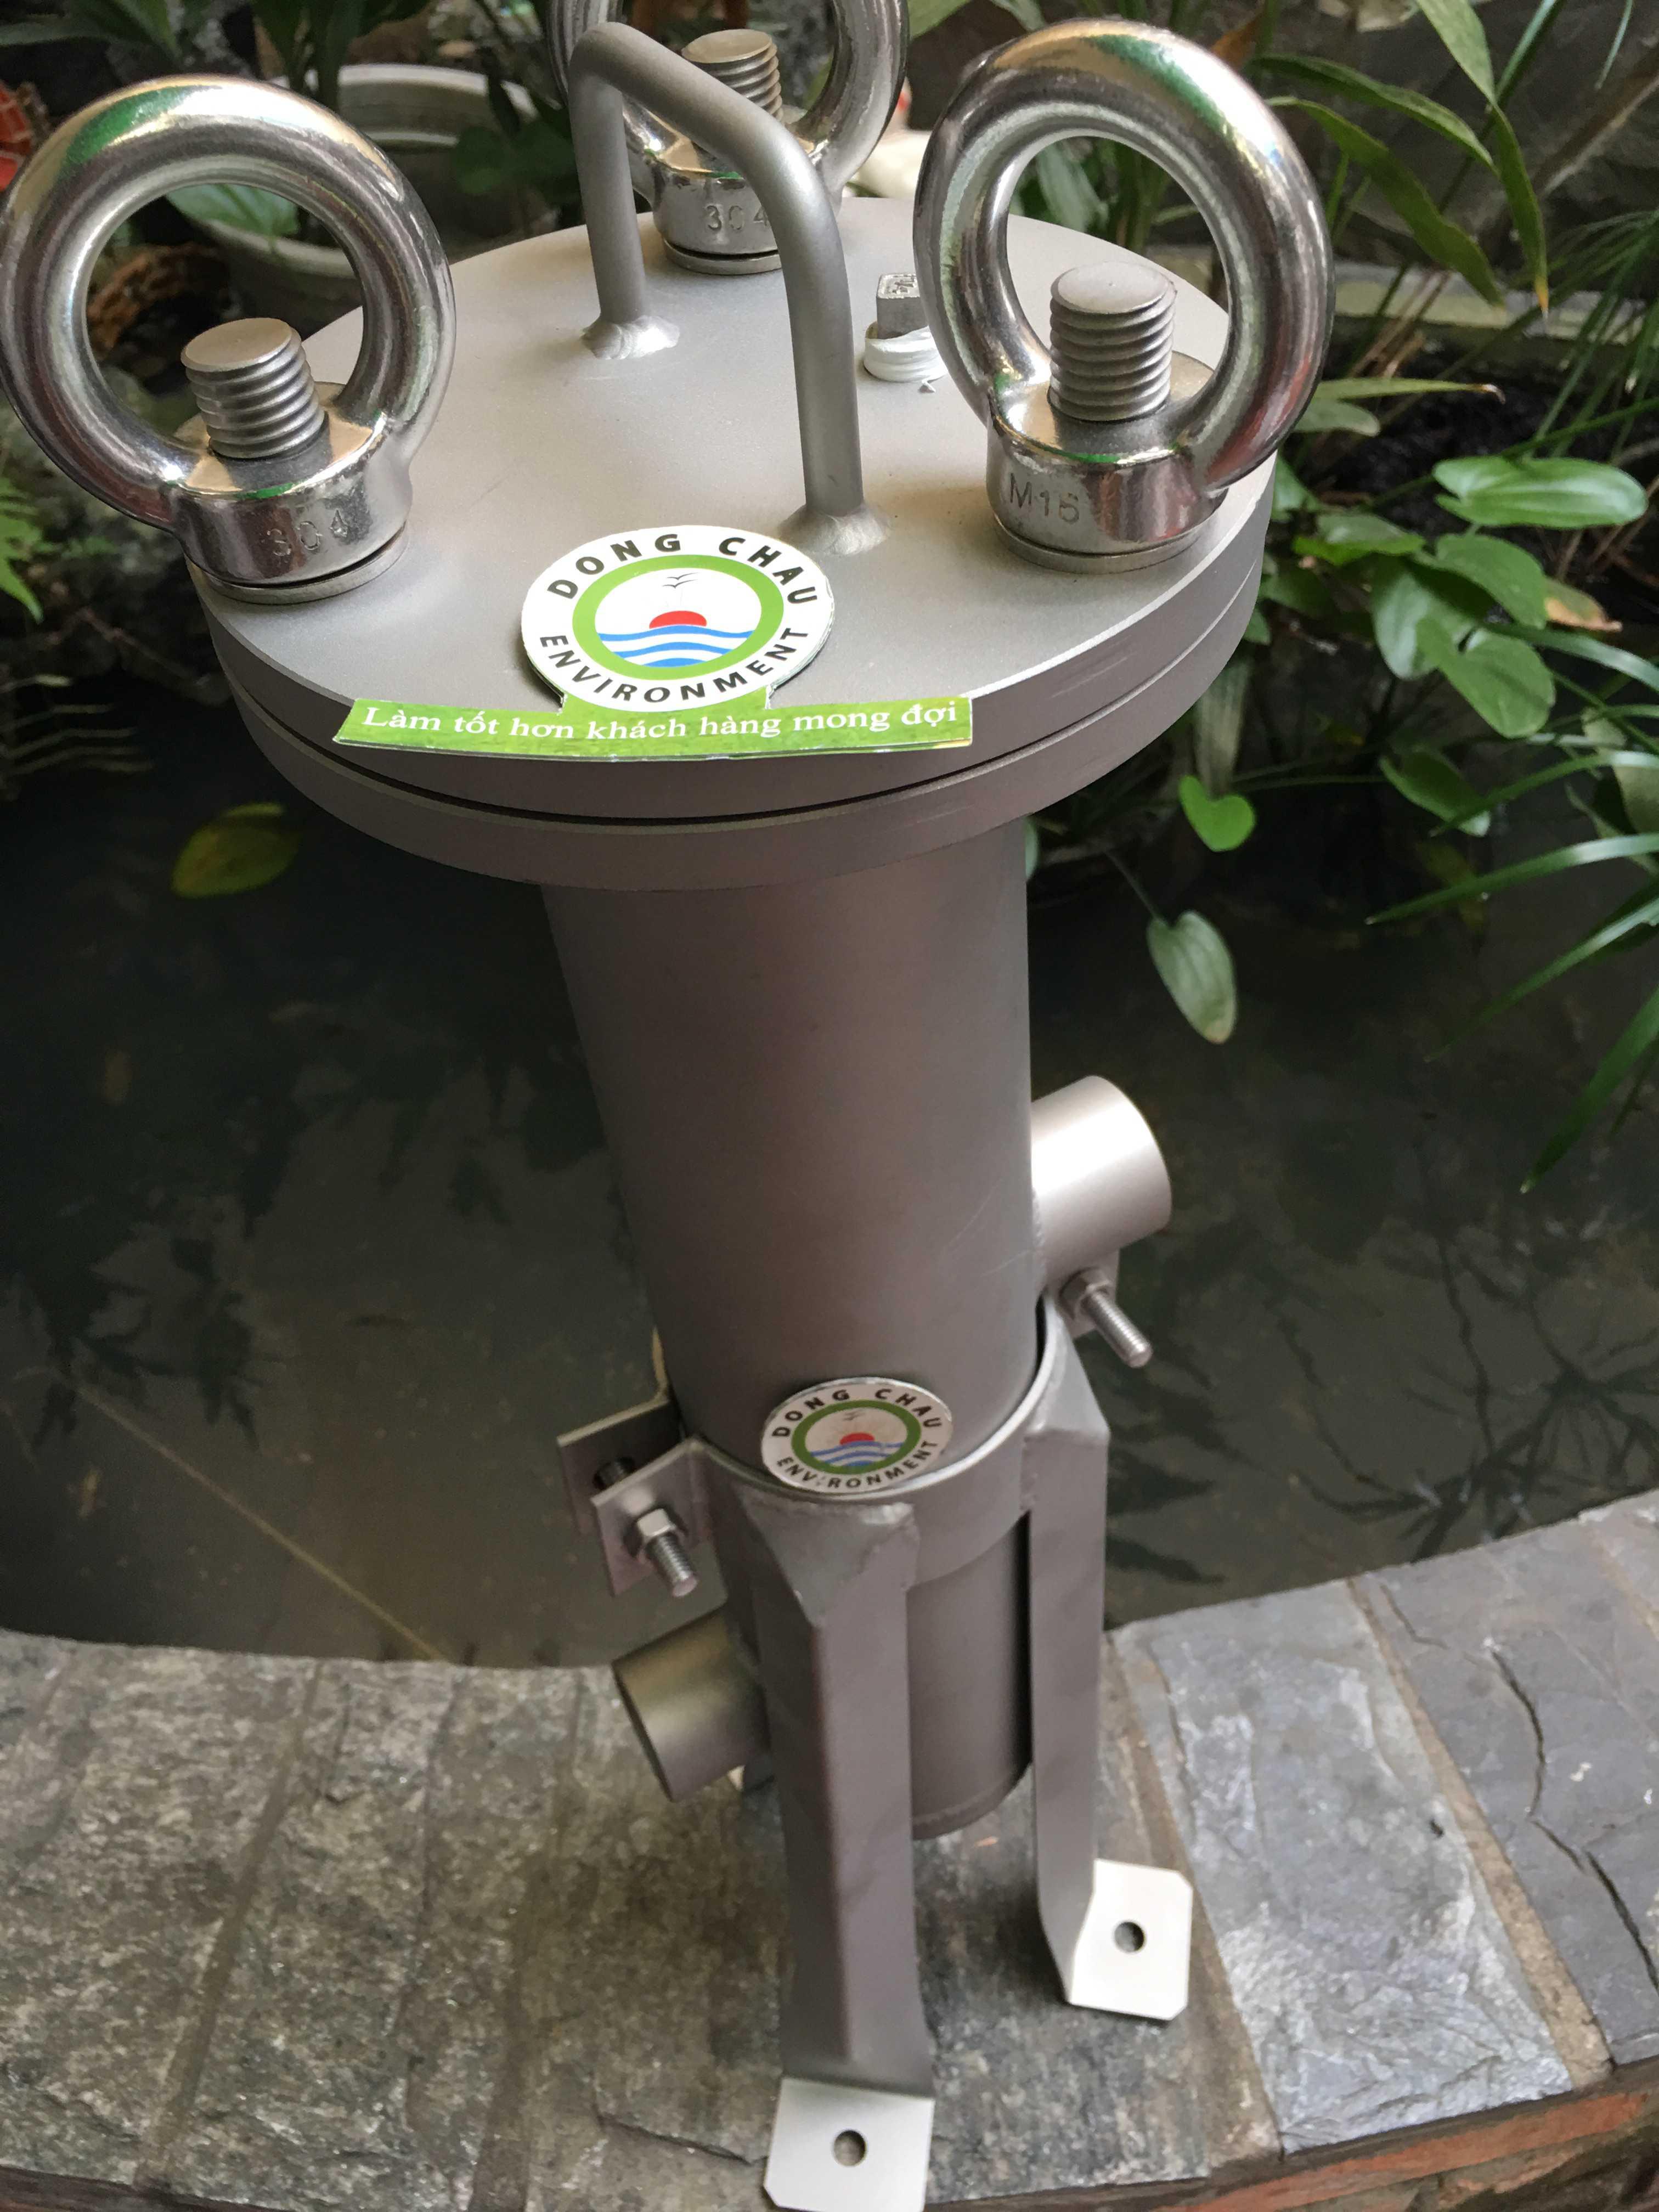 Bình lọc 1 lõi 10 inch singapore doe